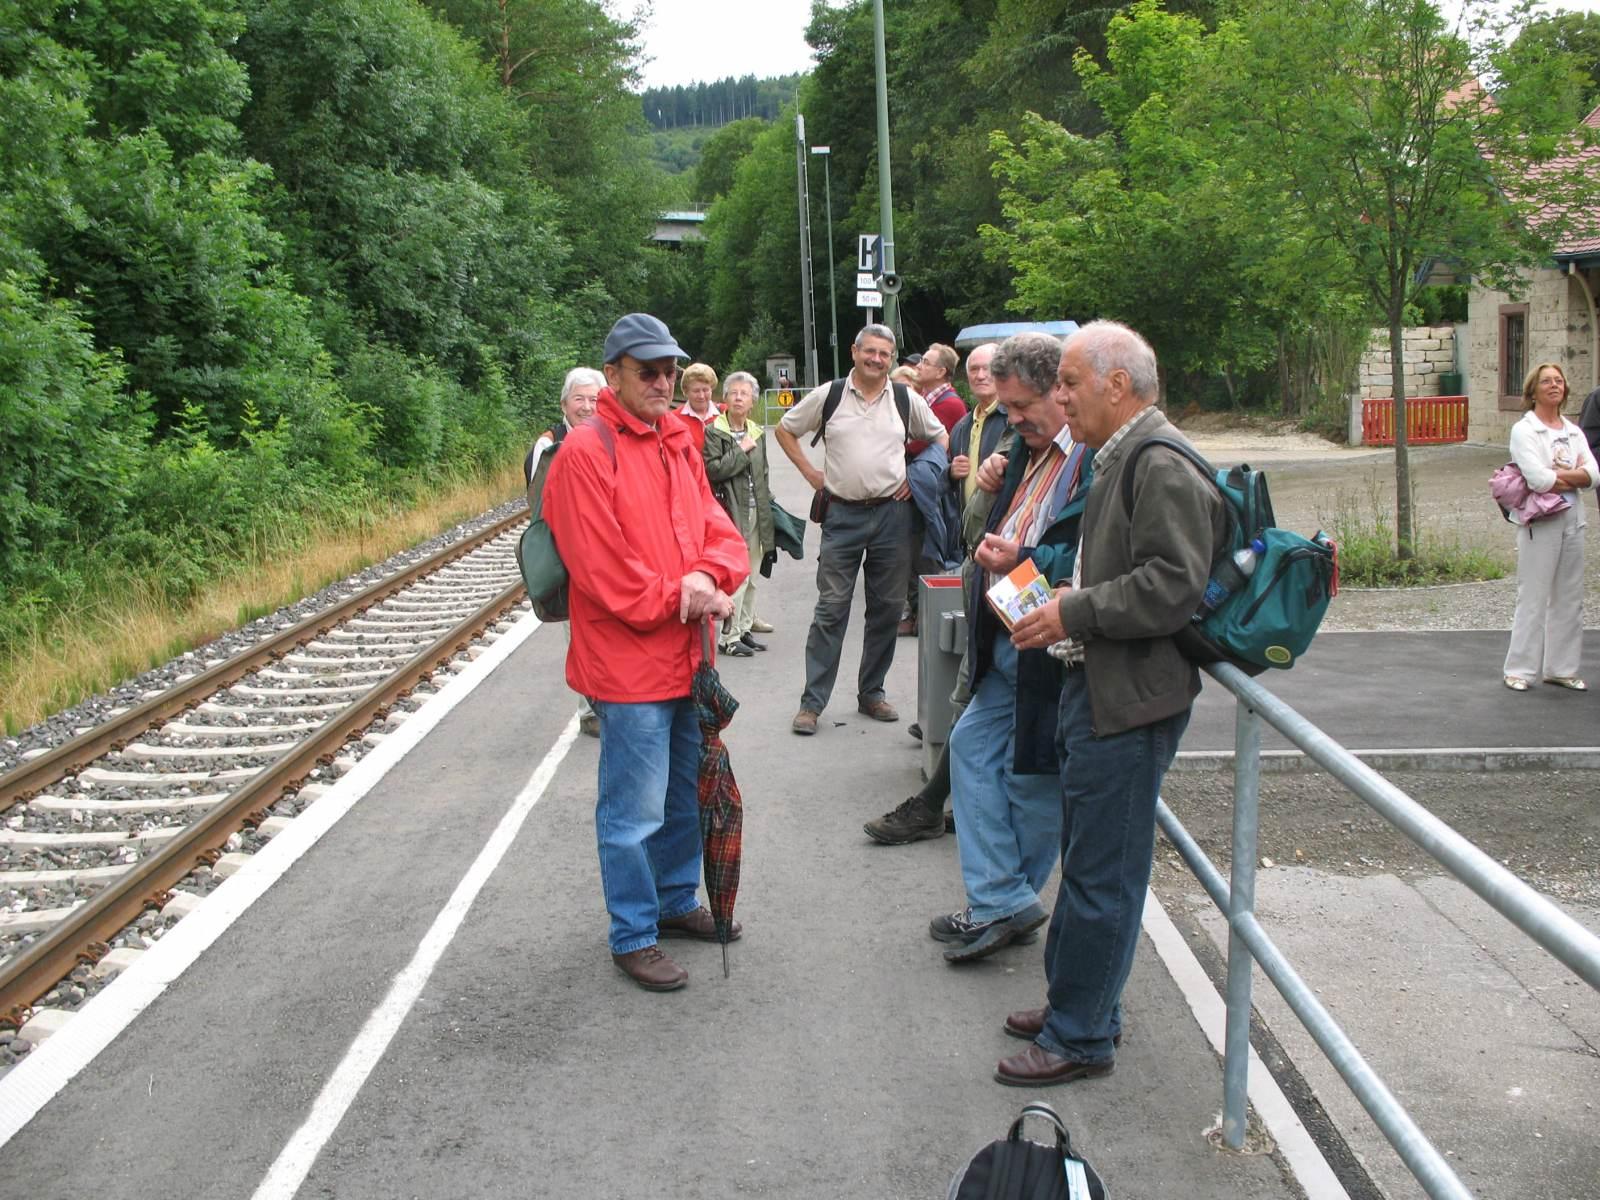 2007_07_11 Beuron, Bahnhof?